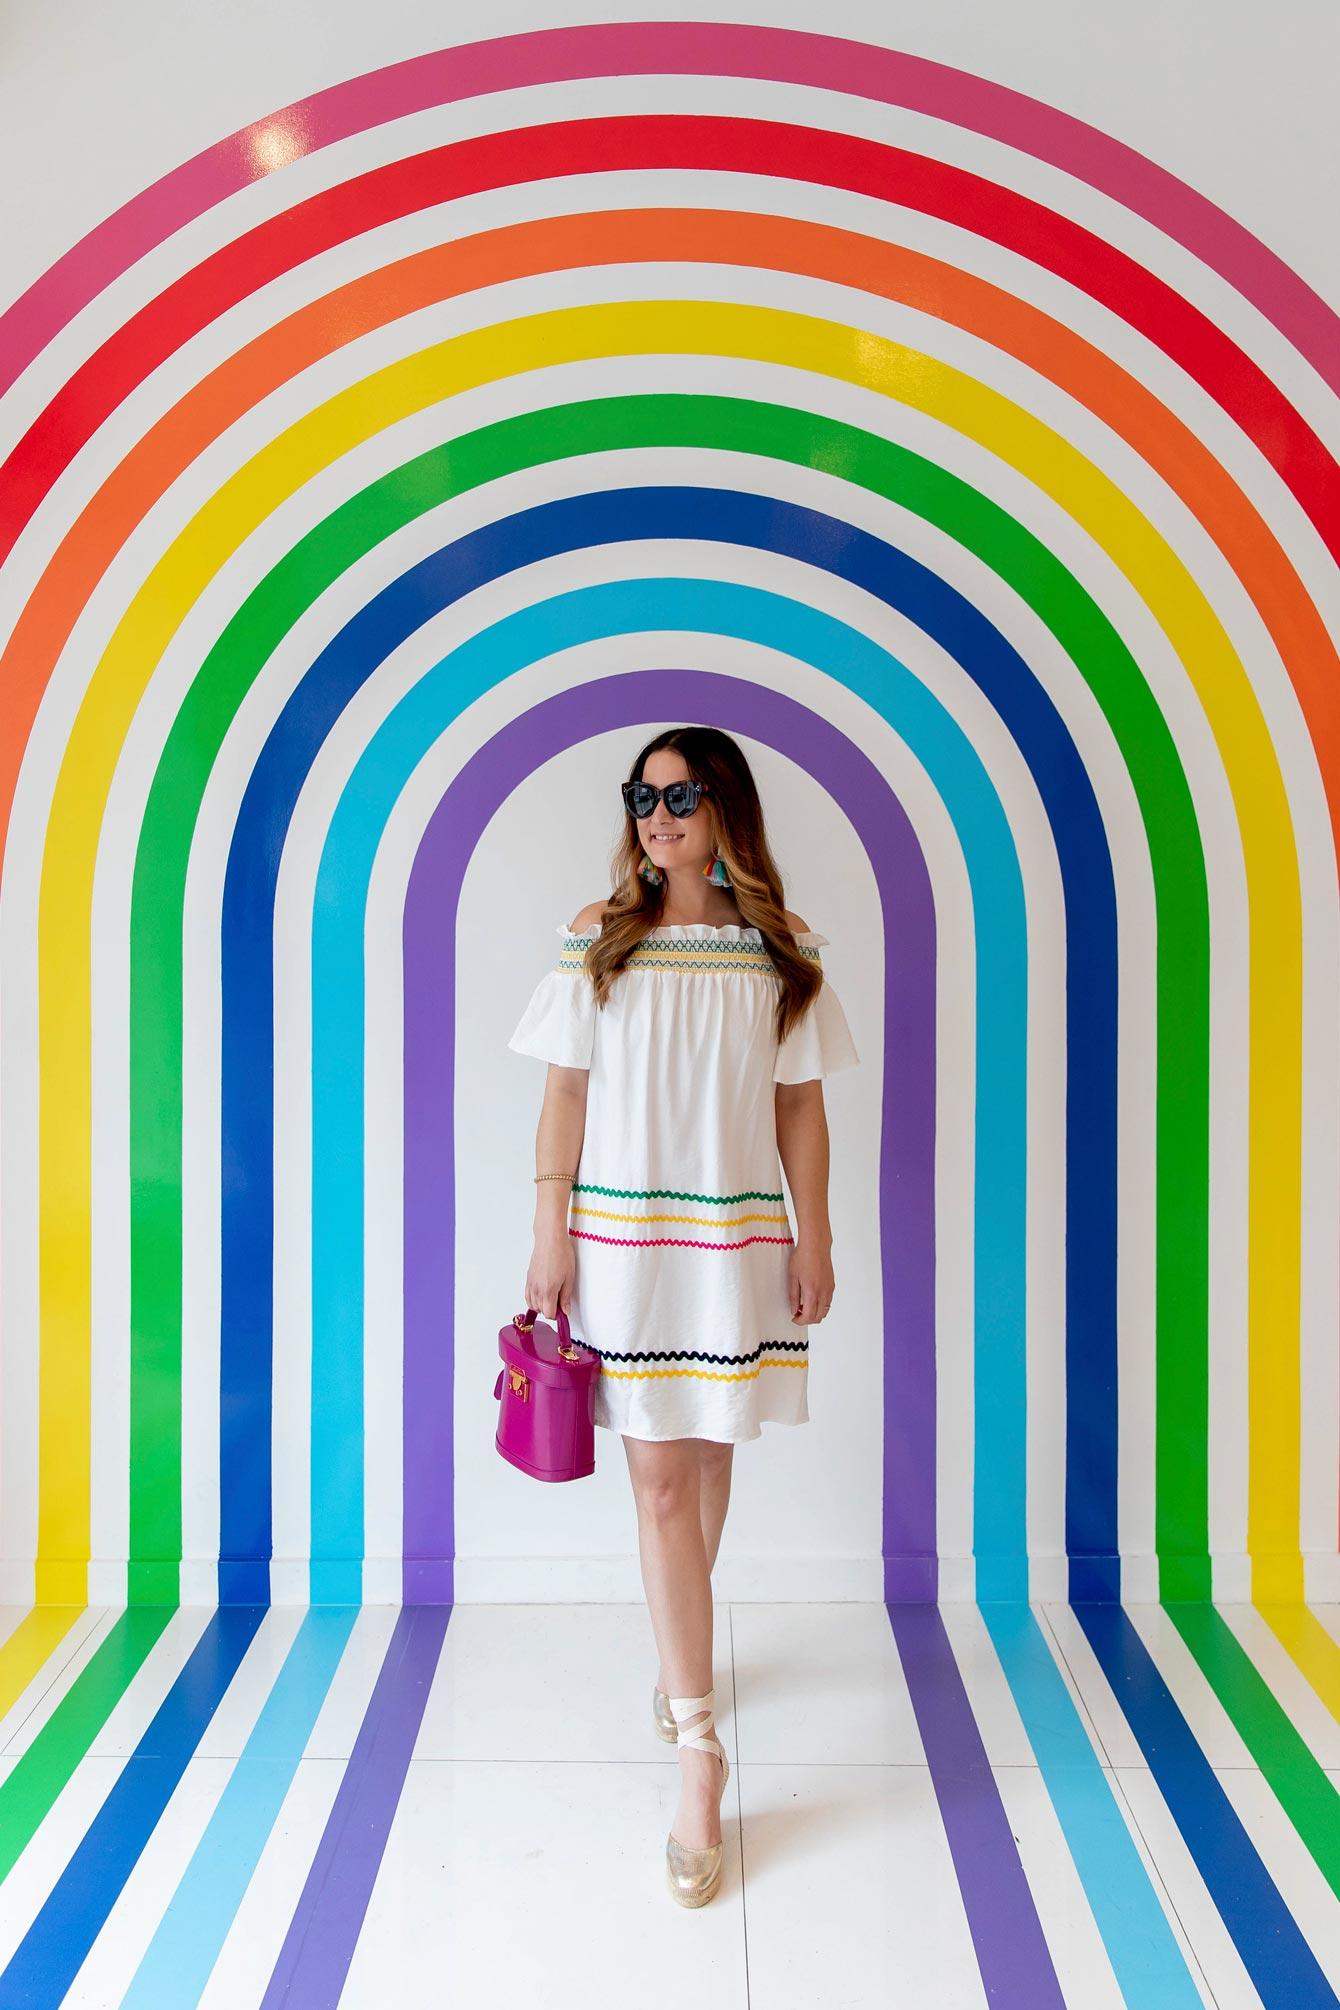 Rainbow Stripe Mural New York City